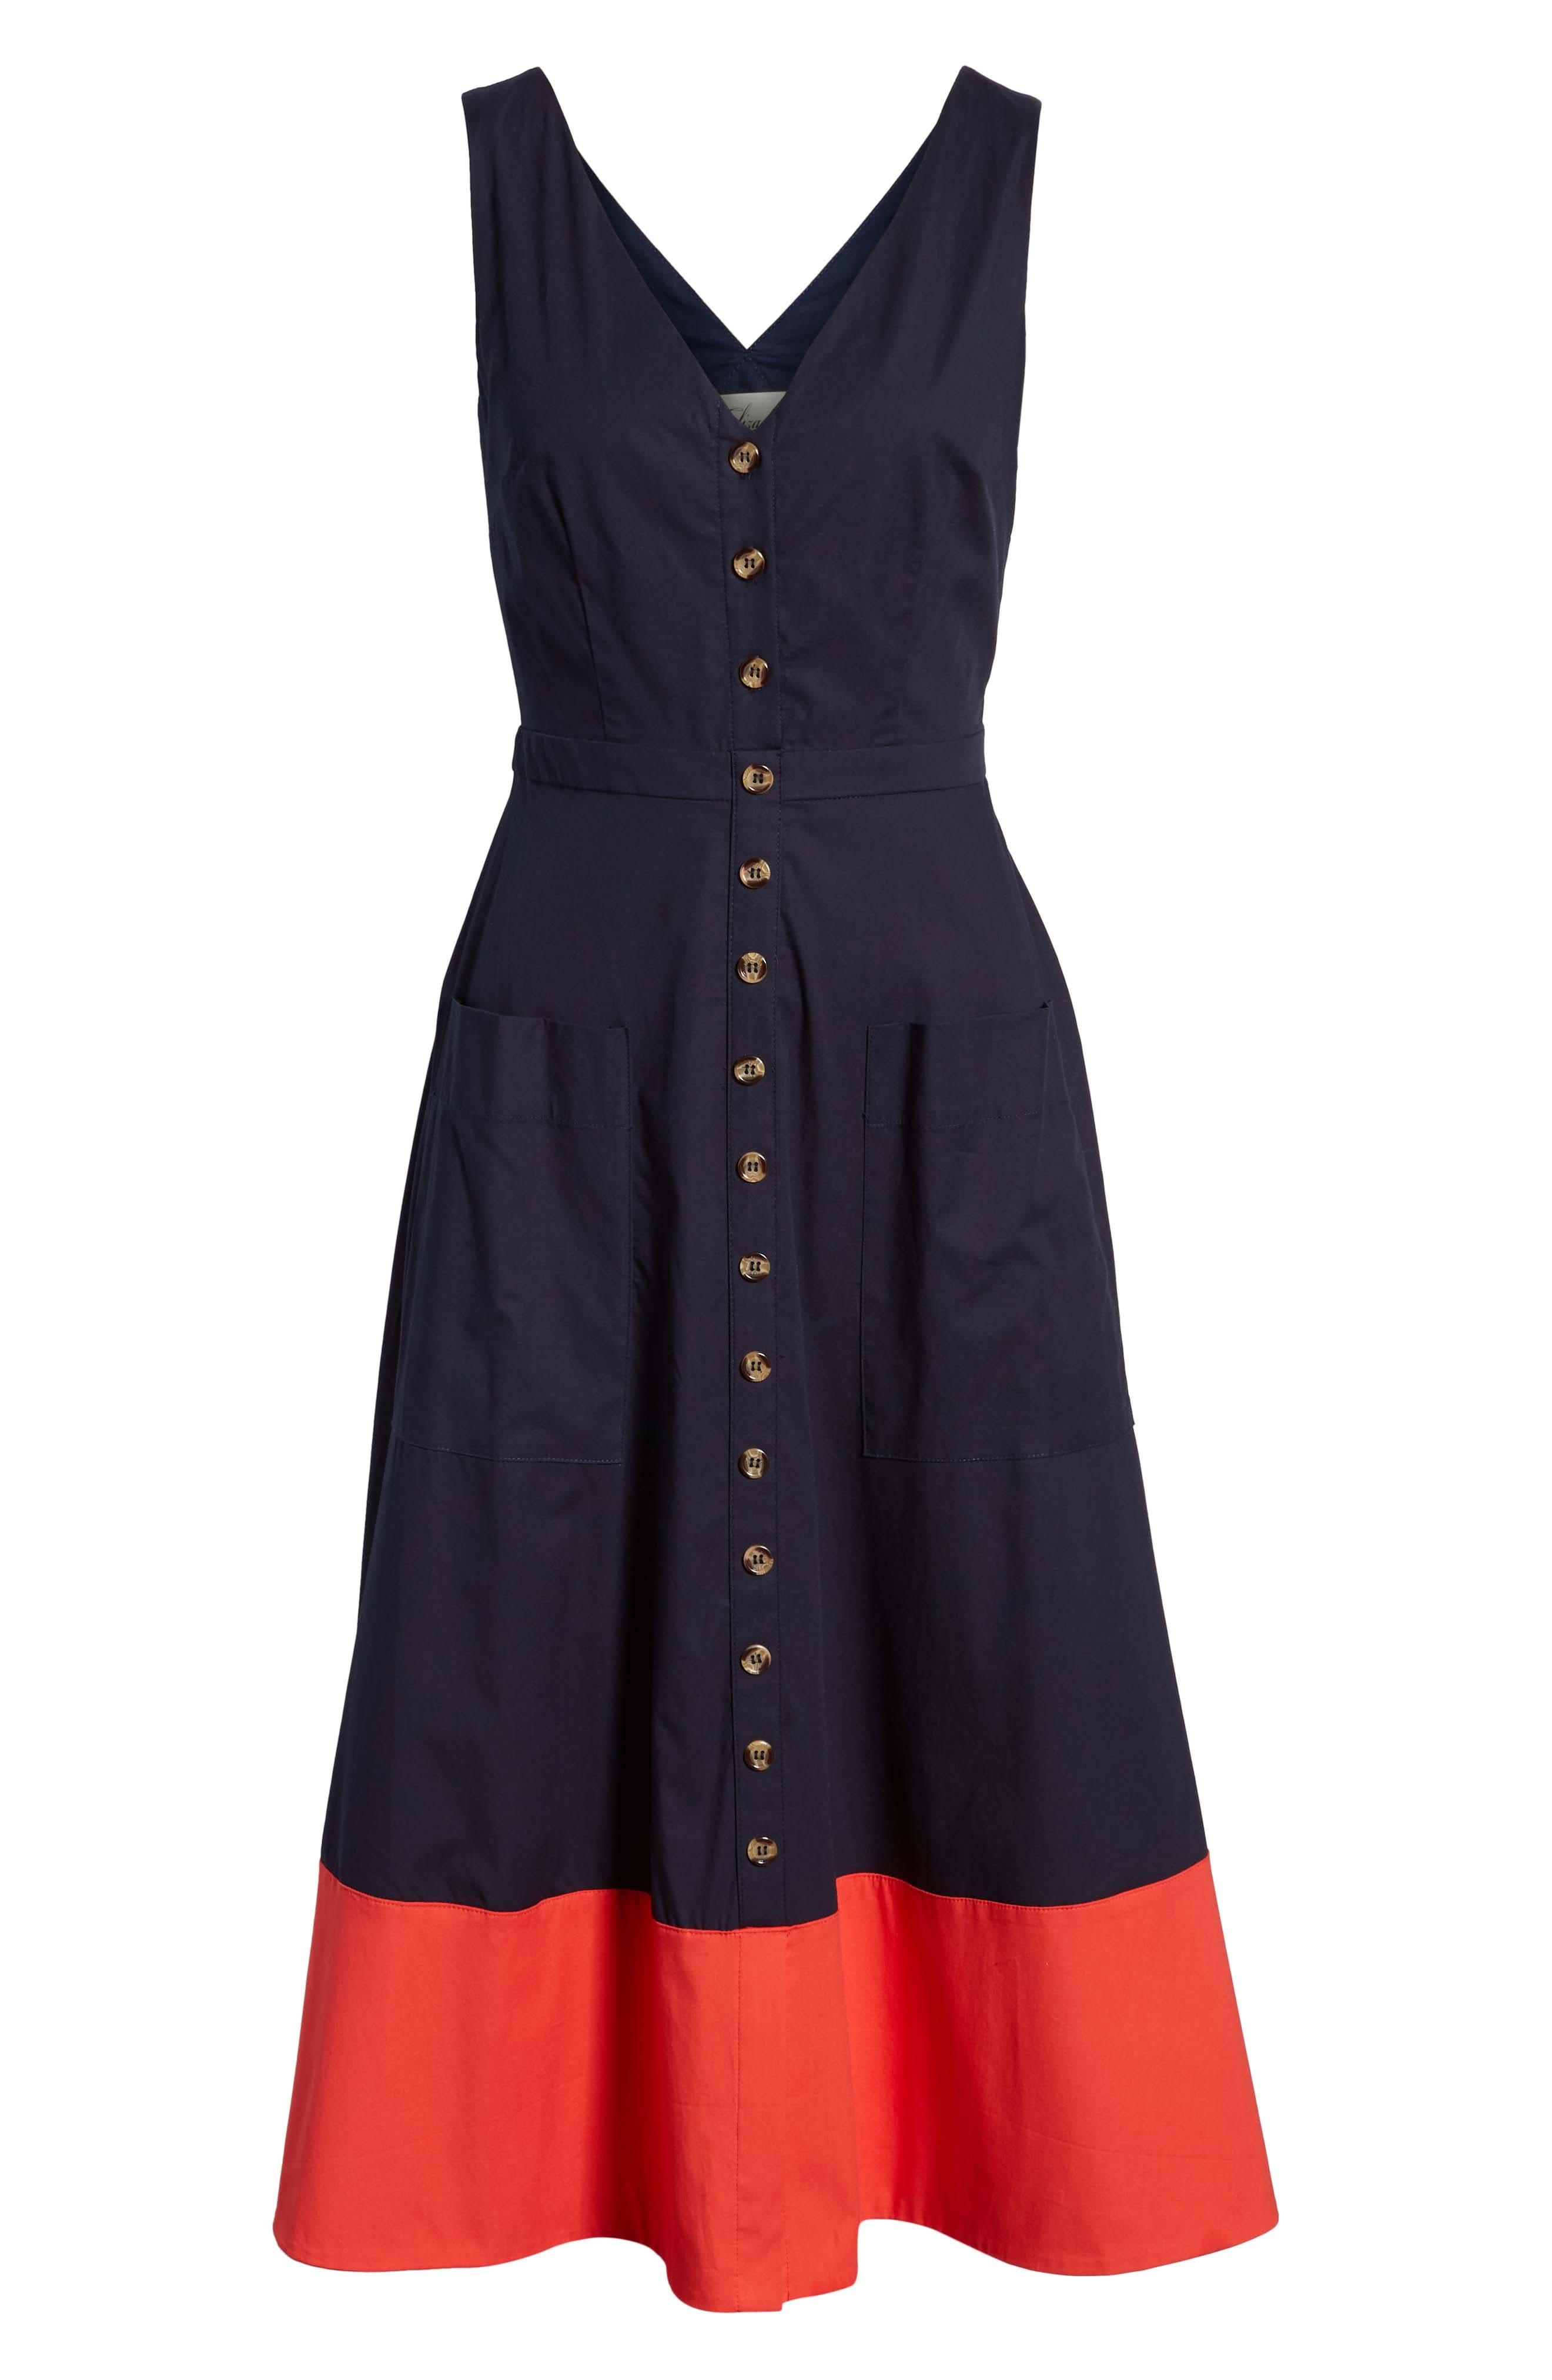 Colorblock Cotton Midi Dress,                             Alternate thumbnail 6, color,                             NAVY RED COLOR BLOCK